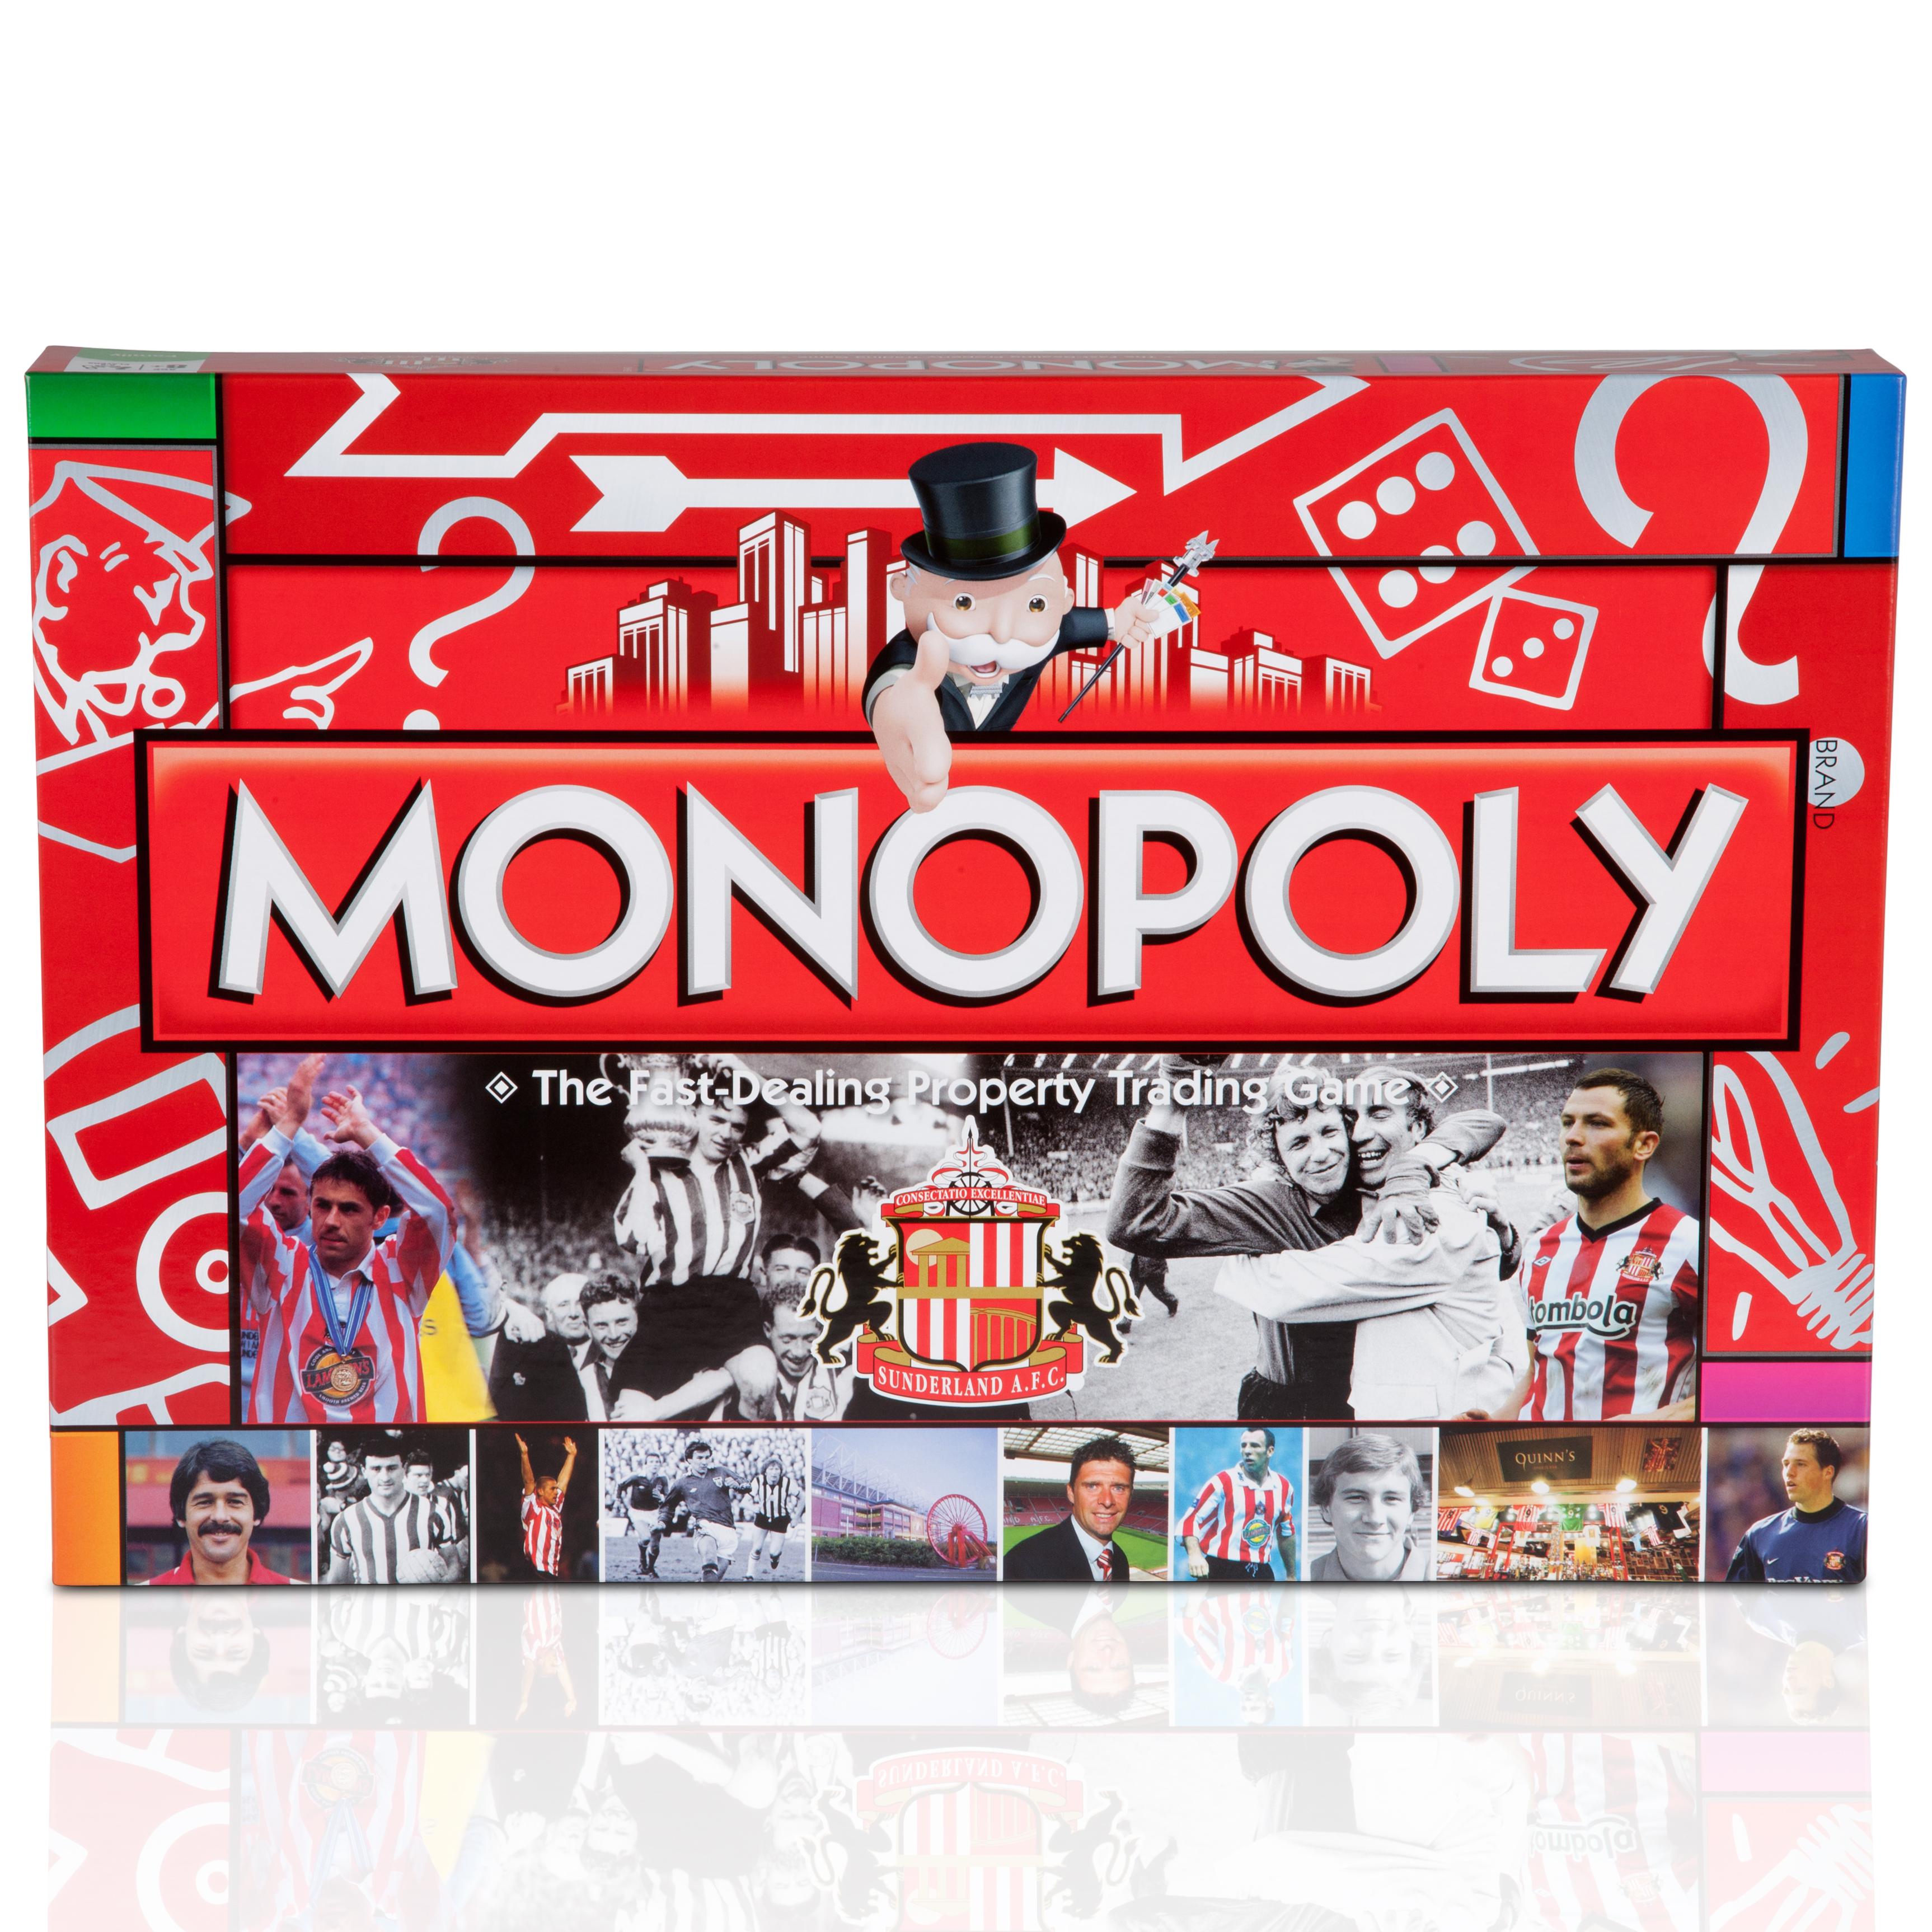 Sunderland Monopoly